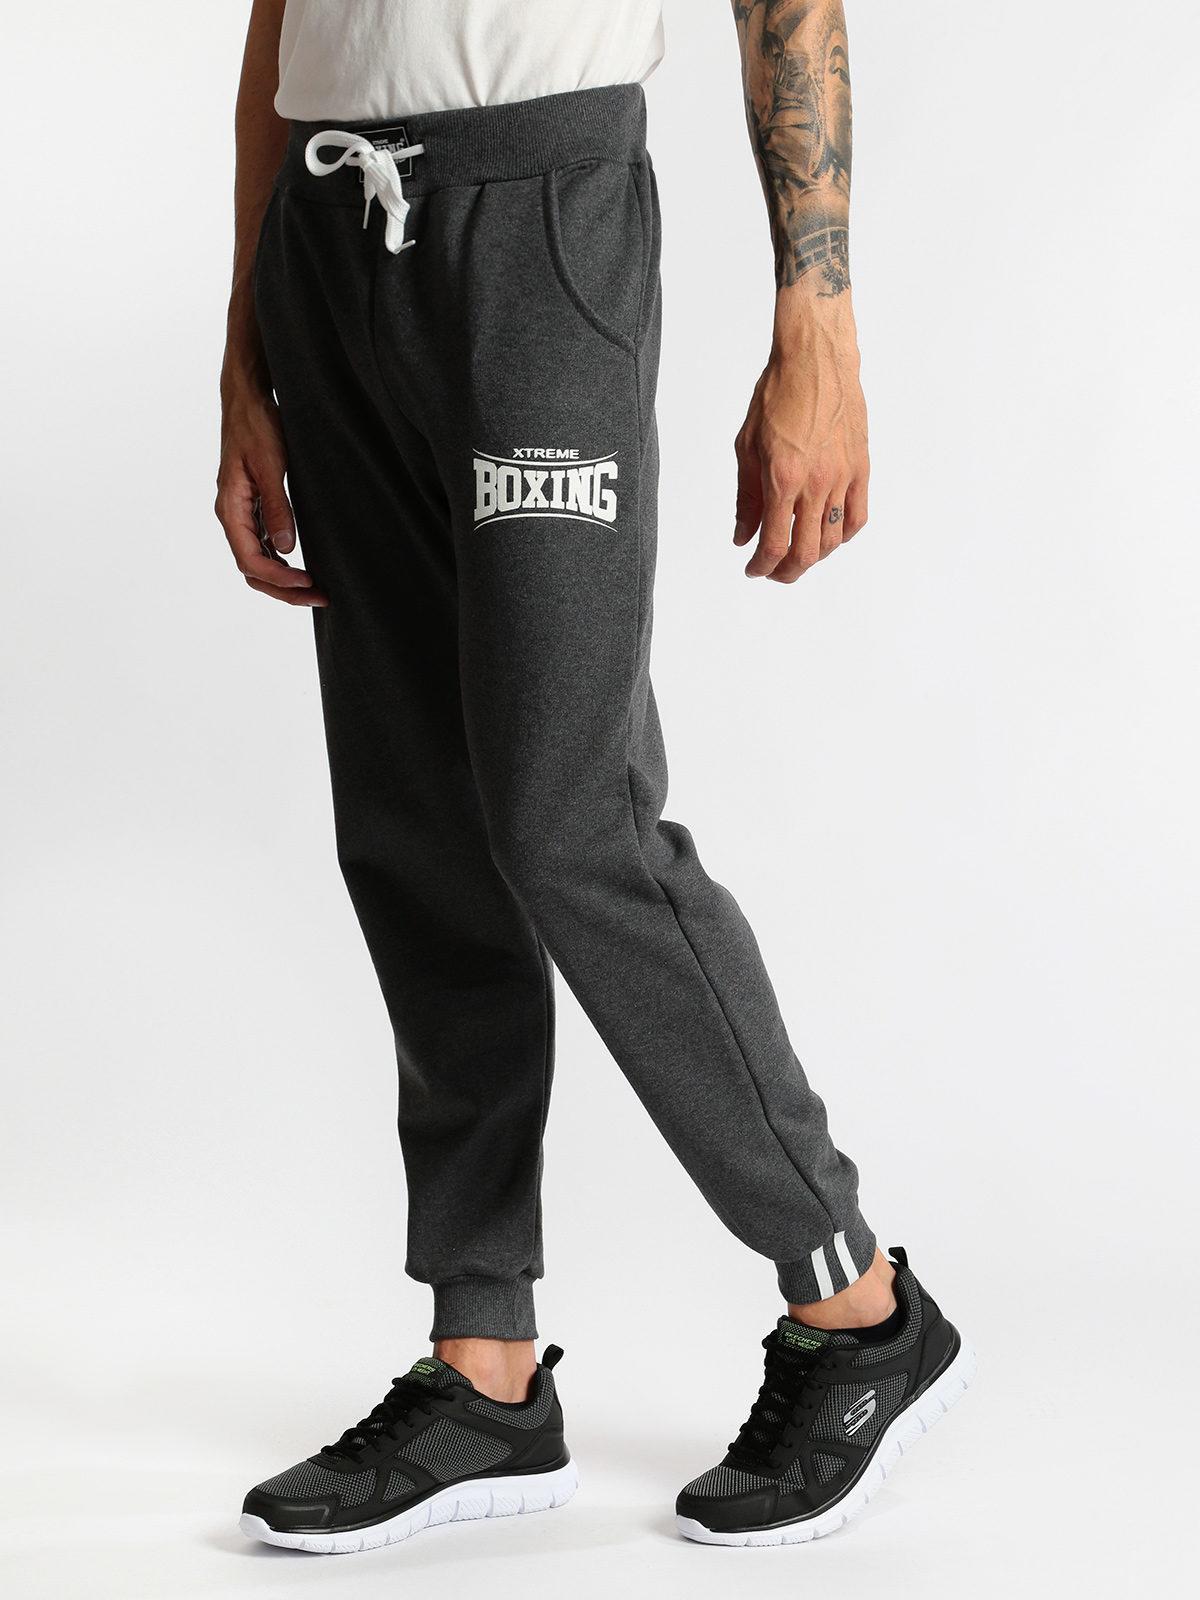 Pantaloni sportivi con polsino boxing | MecShopping